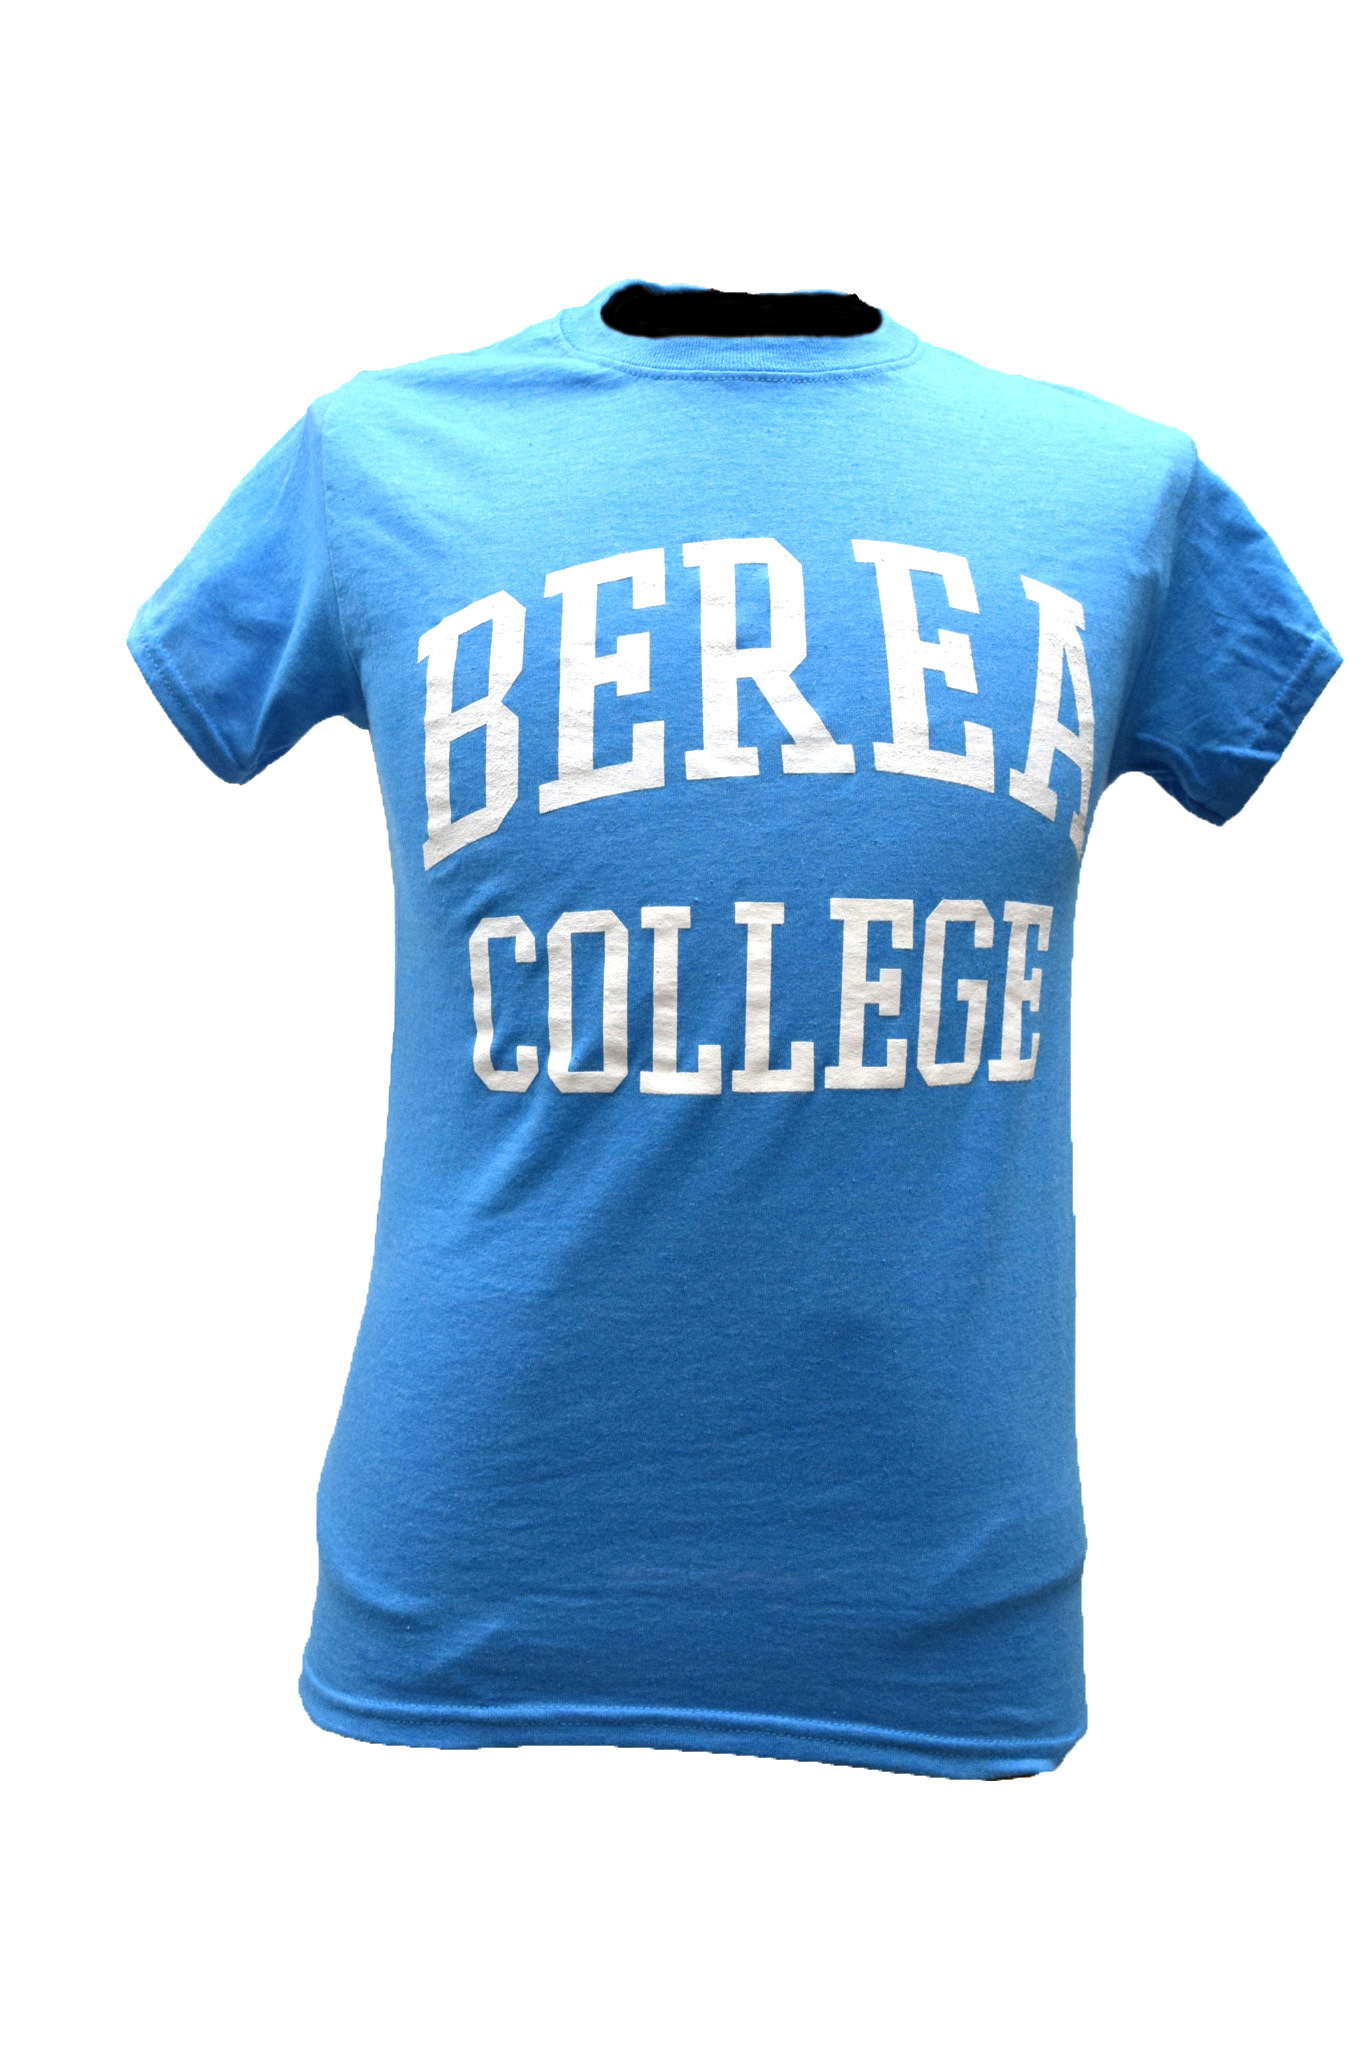 Berea College Classic T- Shirt-1